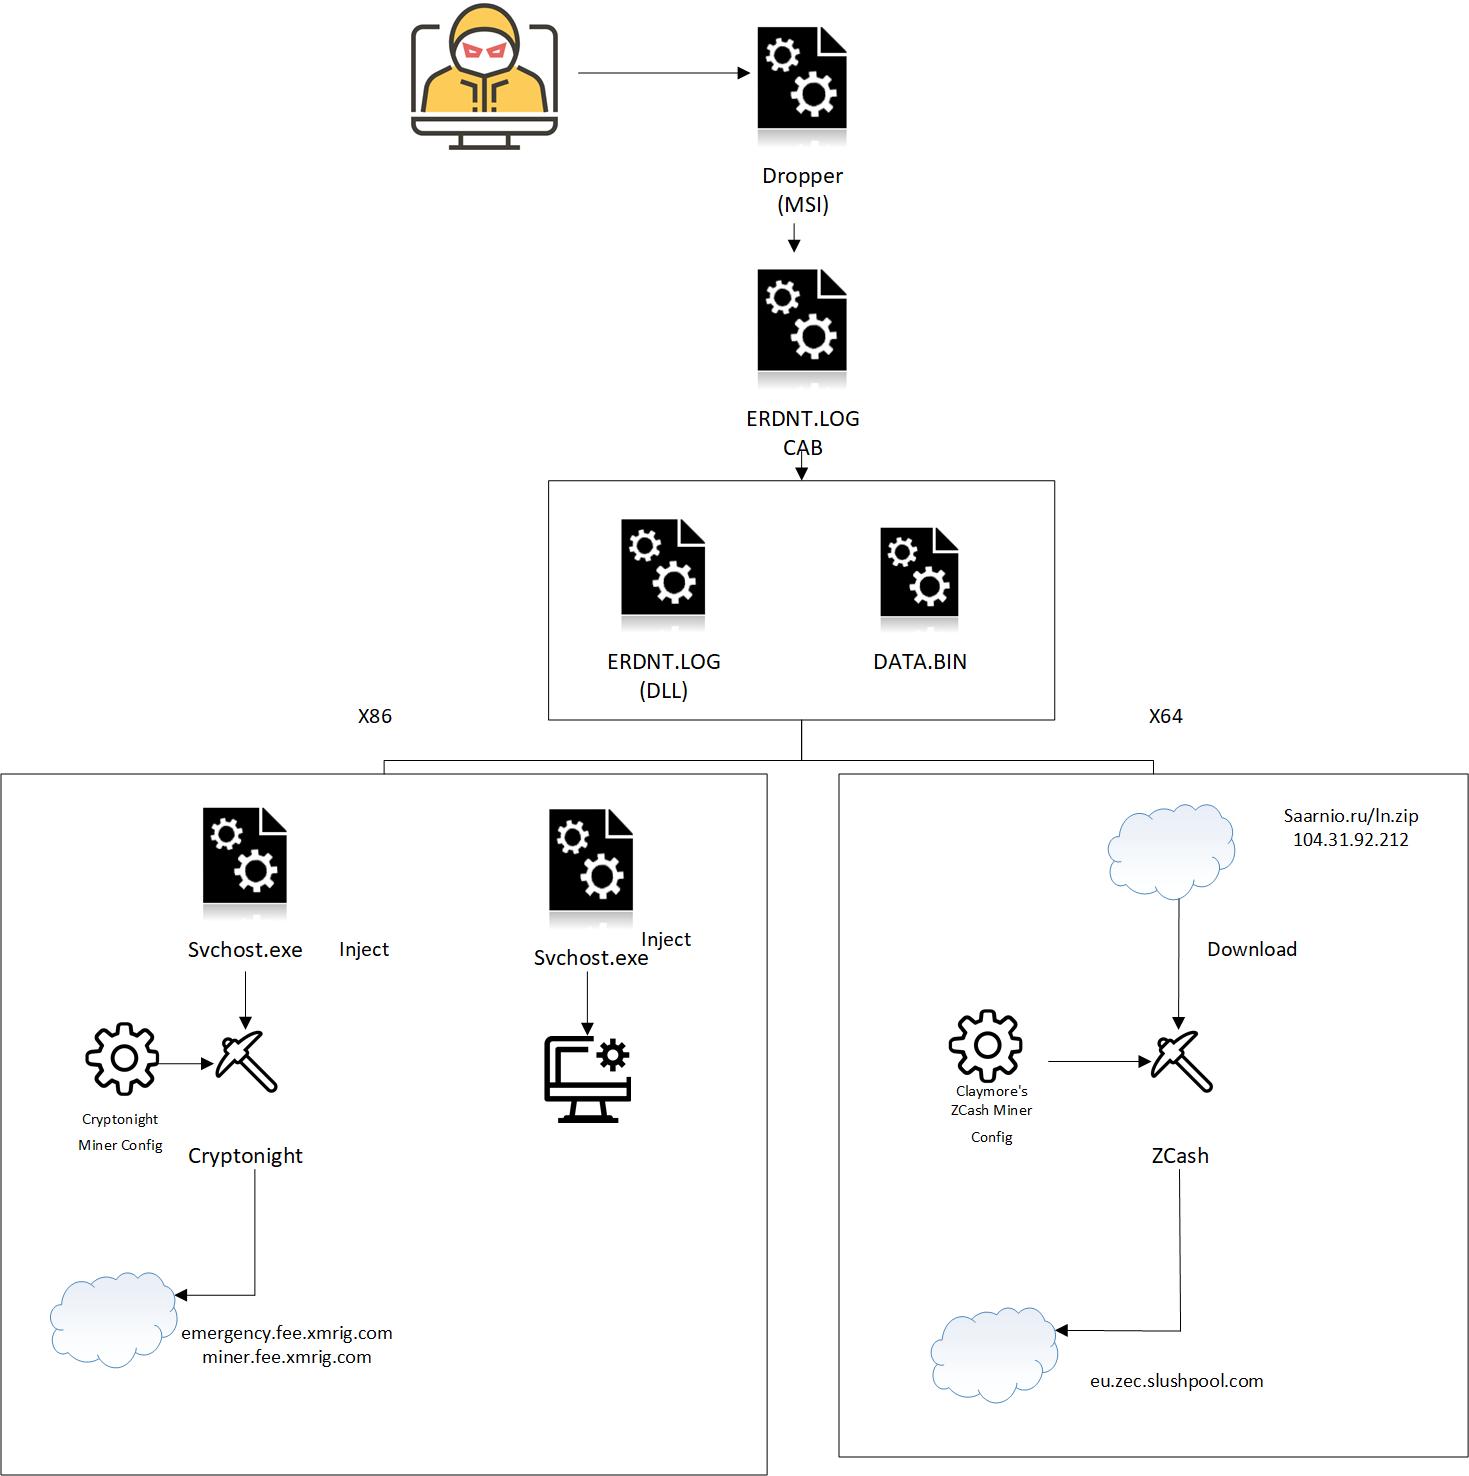 New WebCobra Cryptojacking Malware Uses Platform Specific Miners